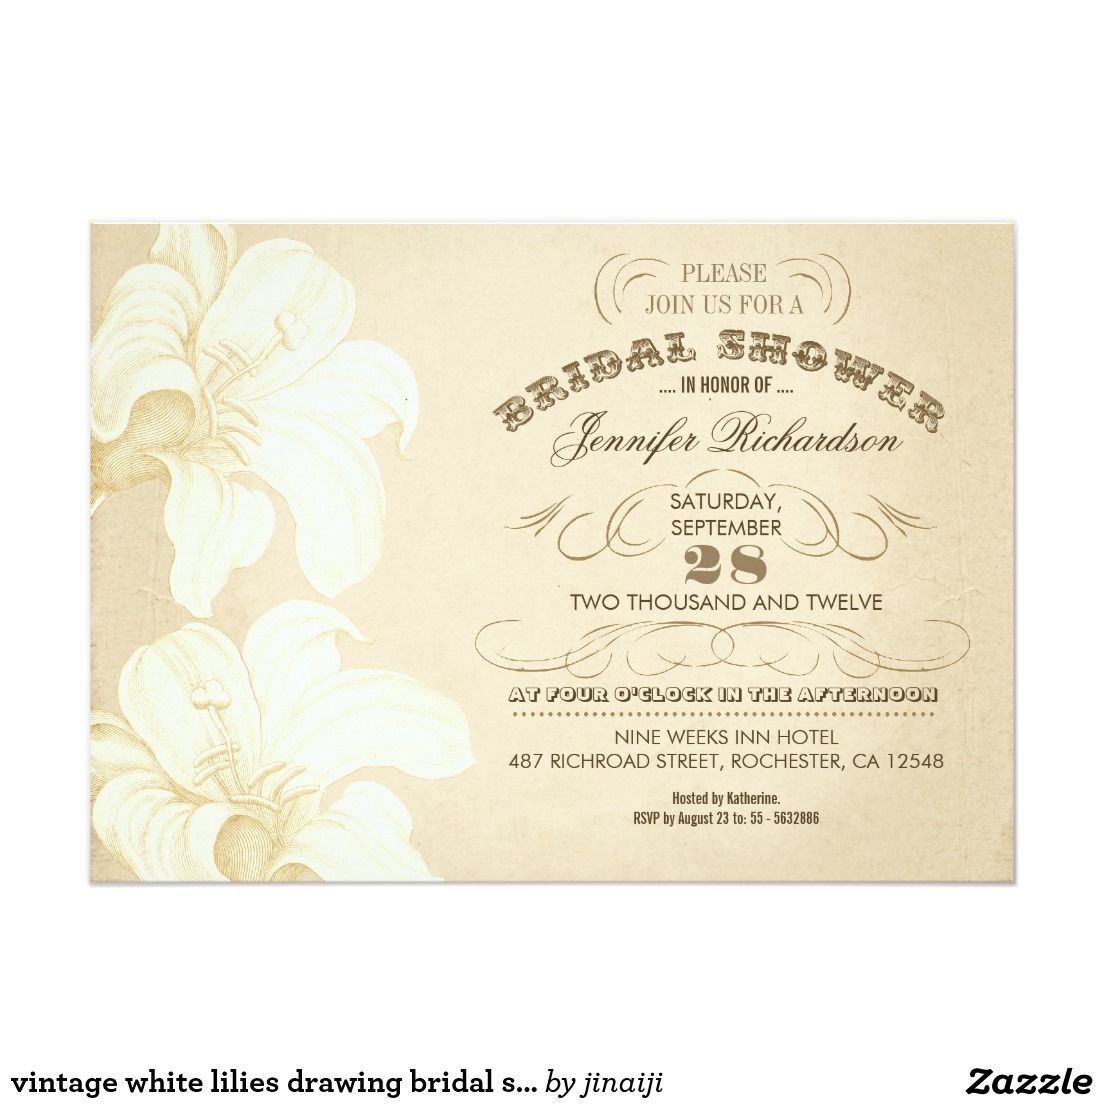 Vintage White Lilies Drawing Bridal Shower Invites Zazzle